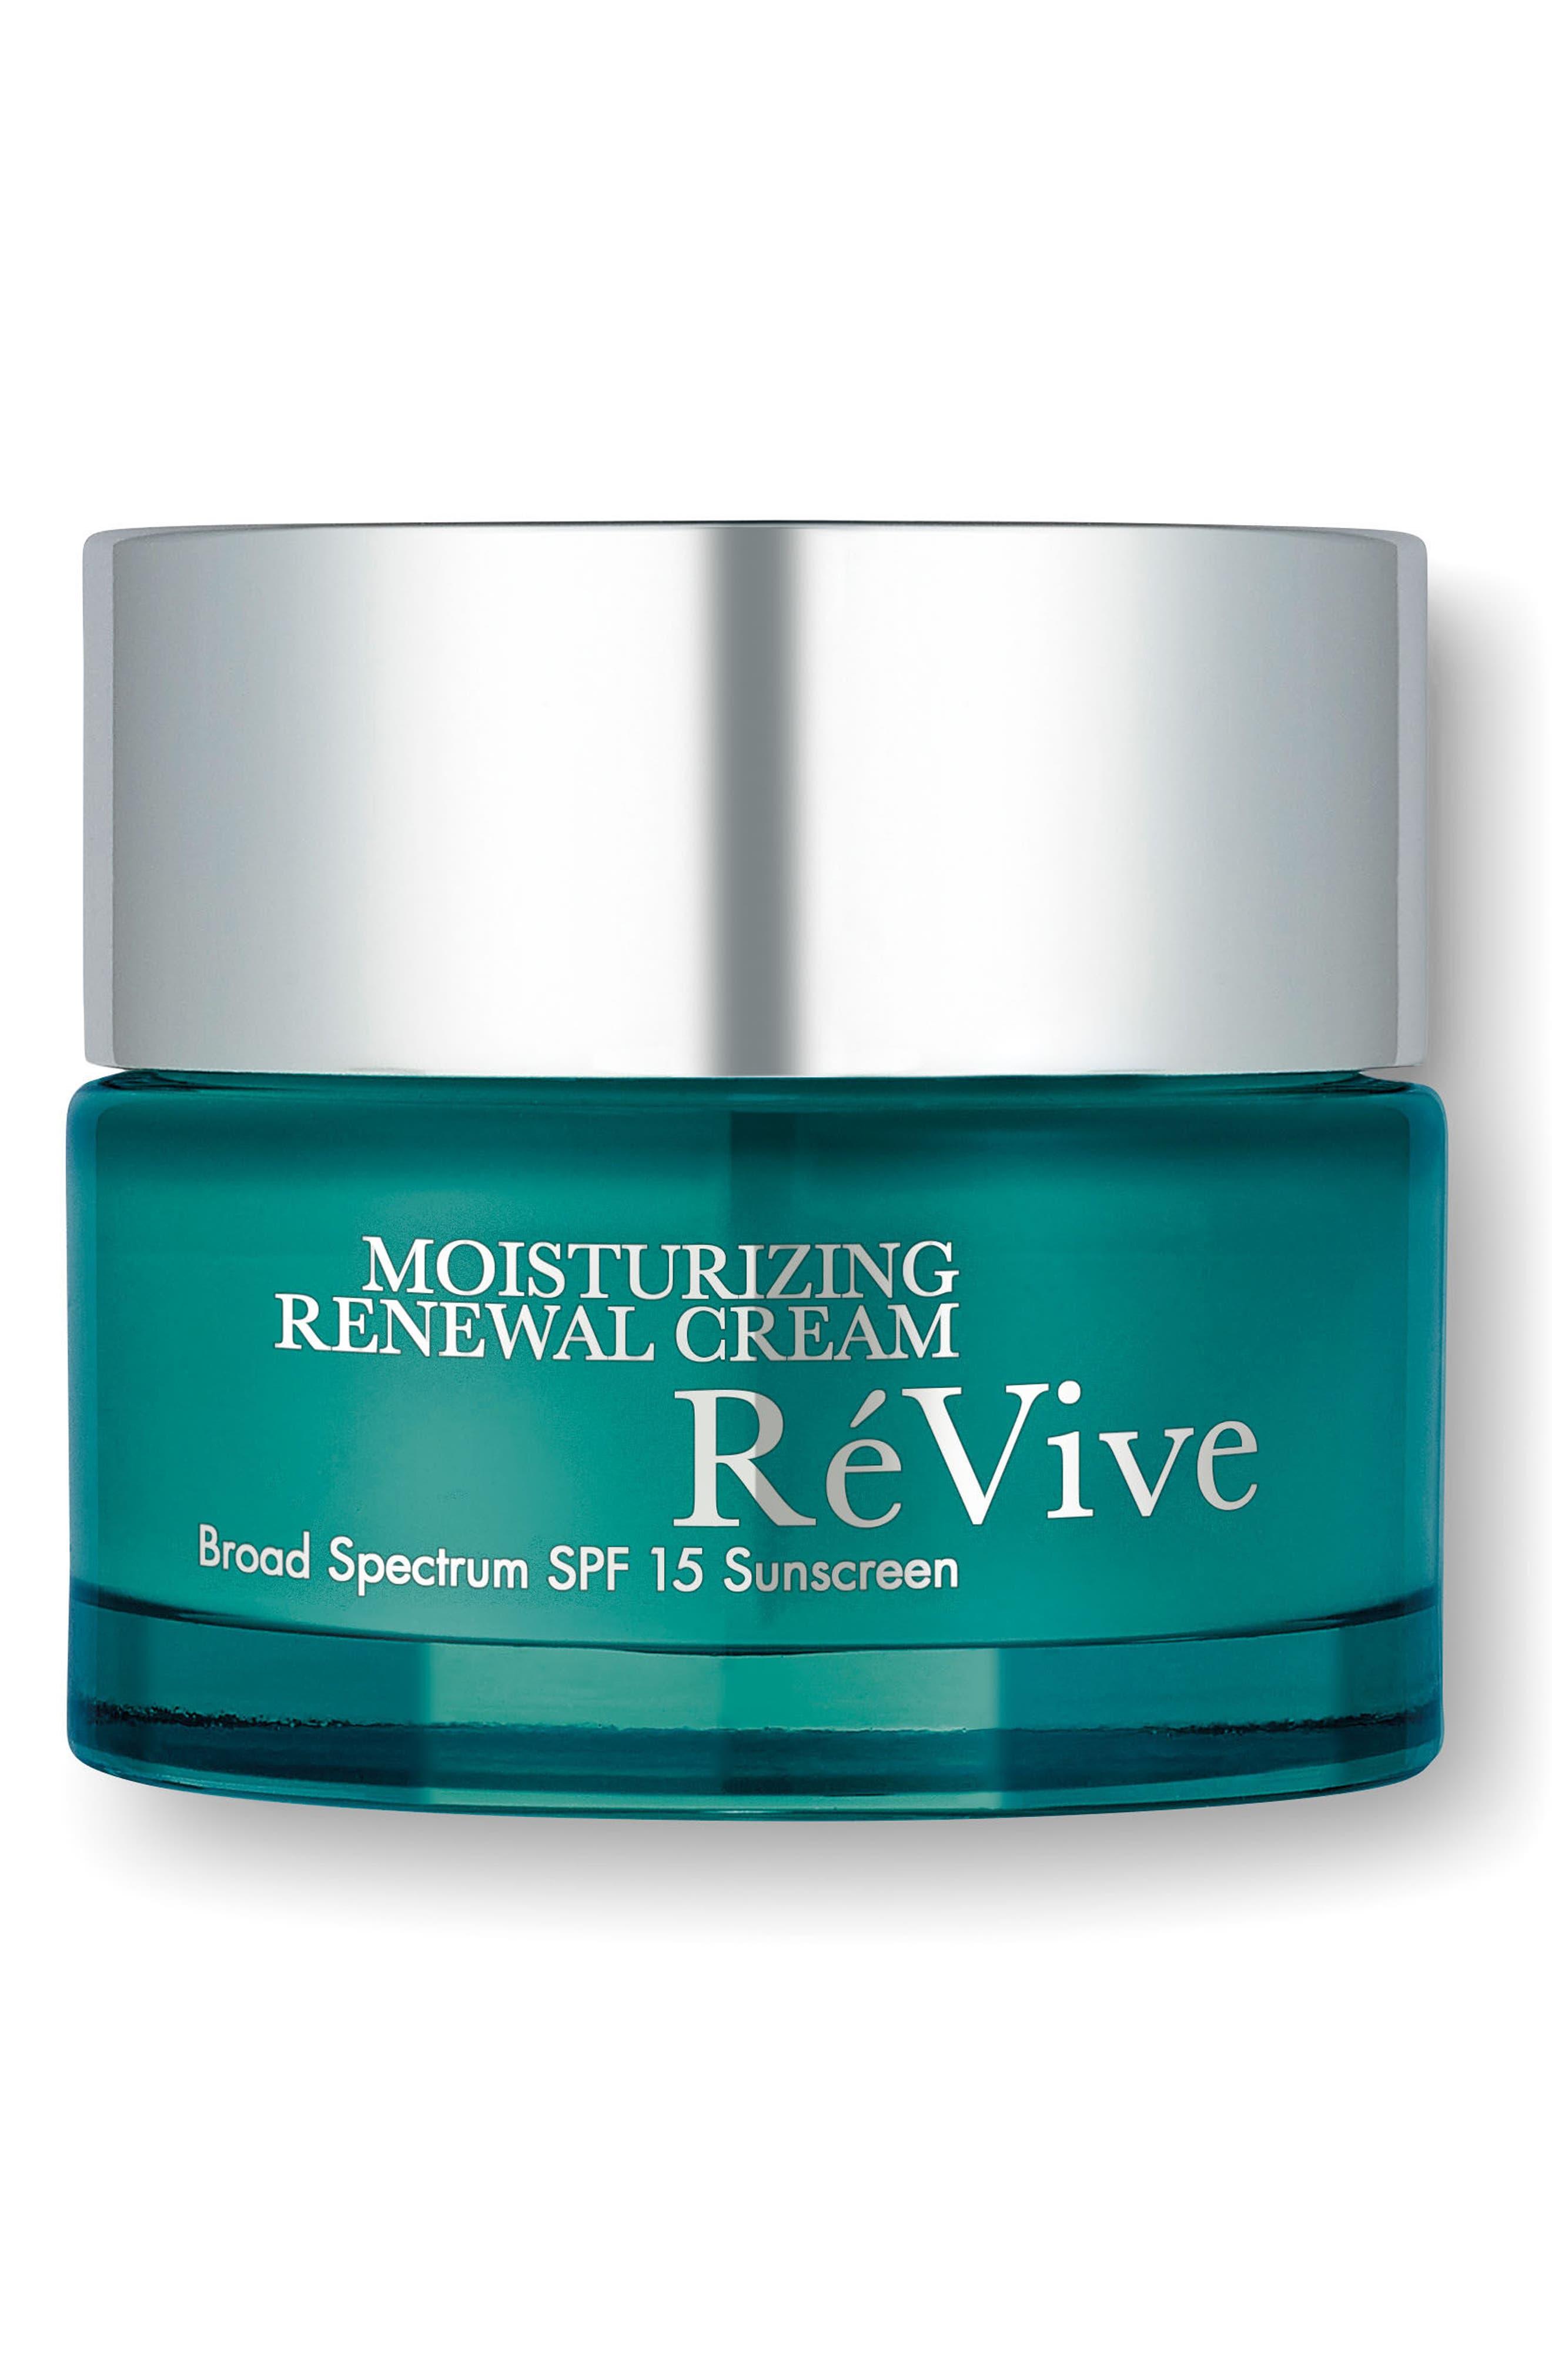 Main Image - RéVive® Moisturizing Renewal Cream Broad Spectrum SPF 15 Sunscreen